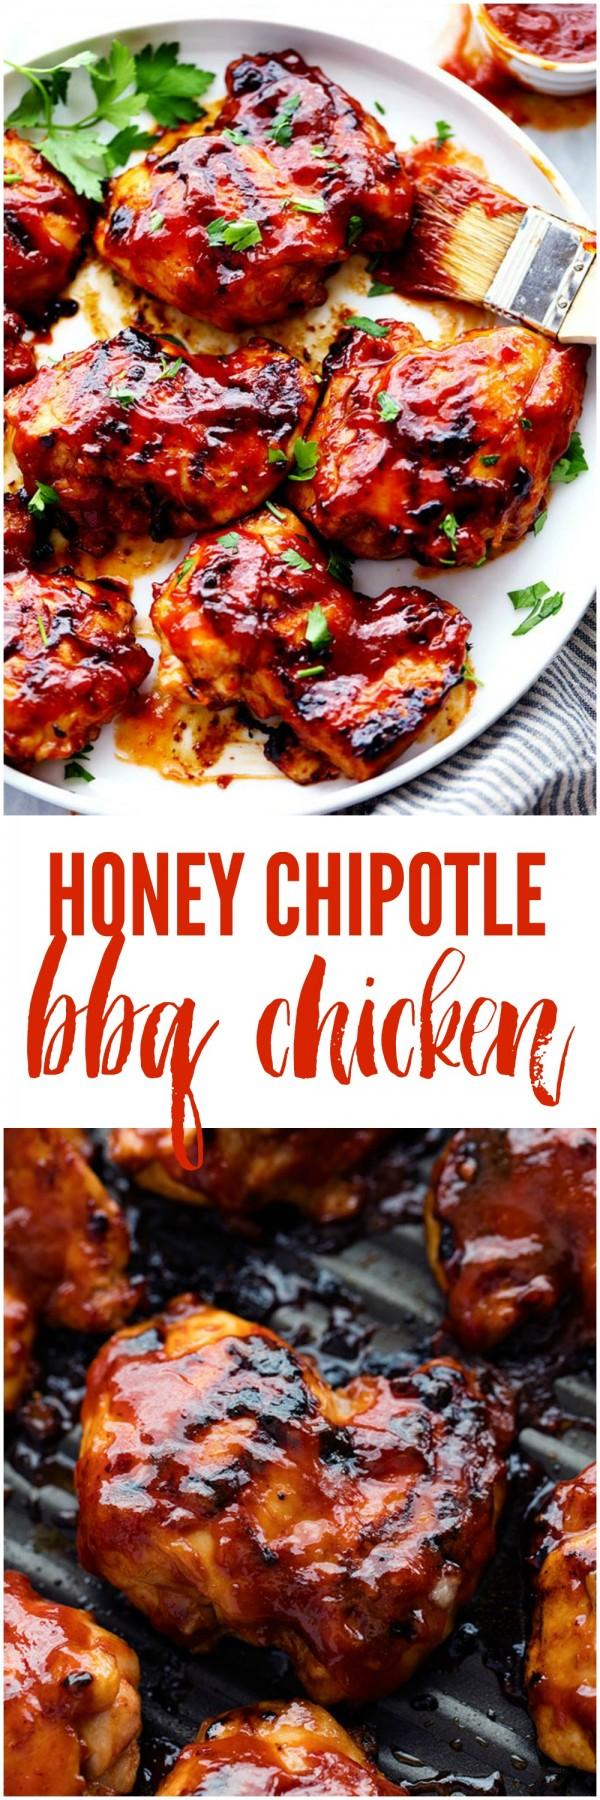 Get the recipe Honey Chipotle BBQ Chicken @recipes_to_go